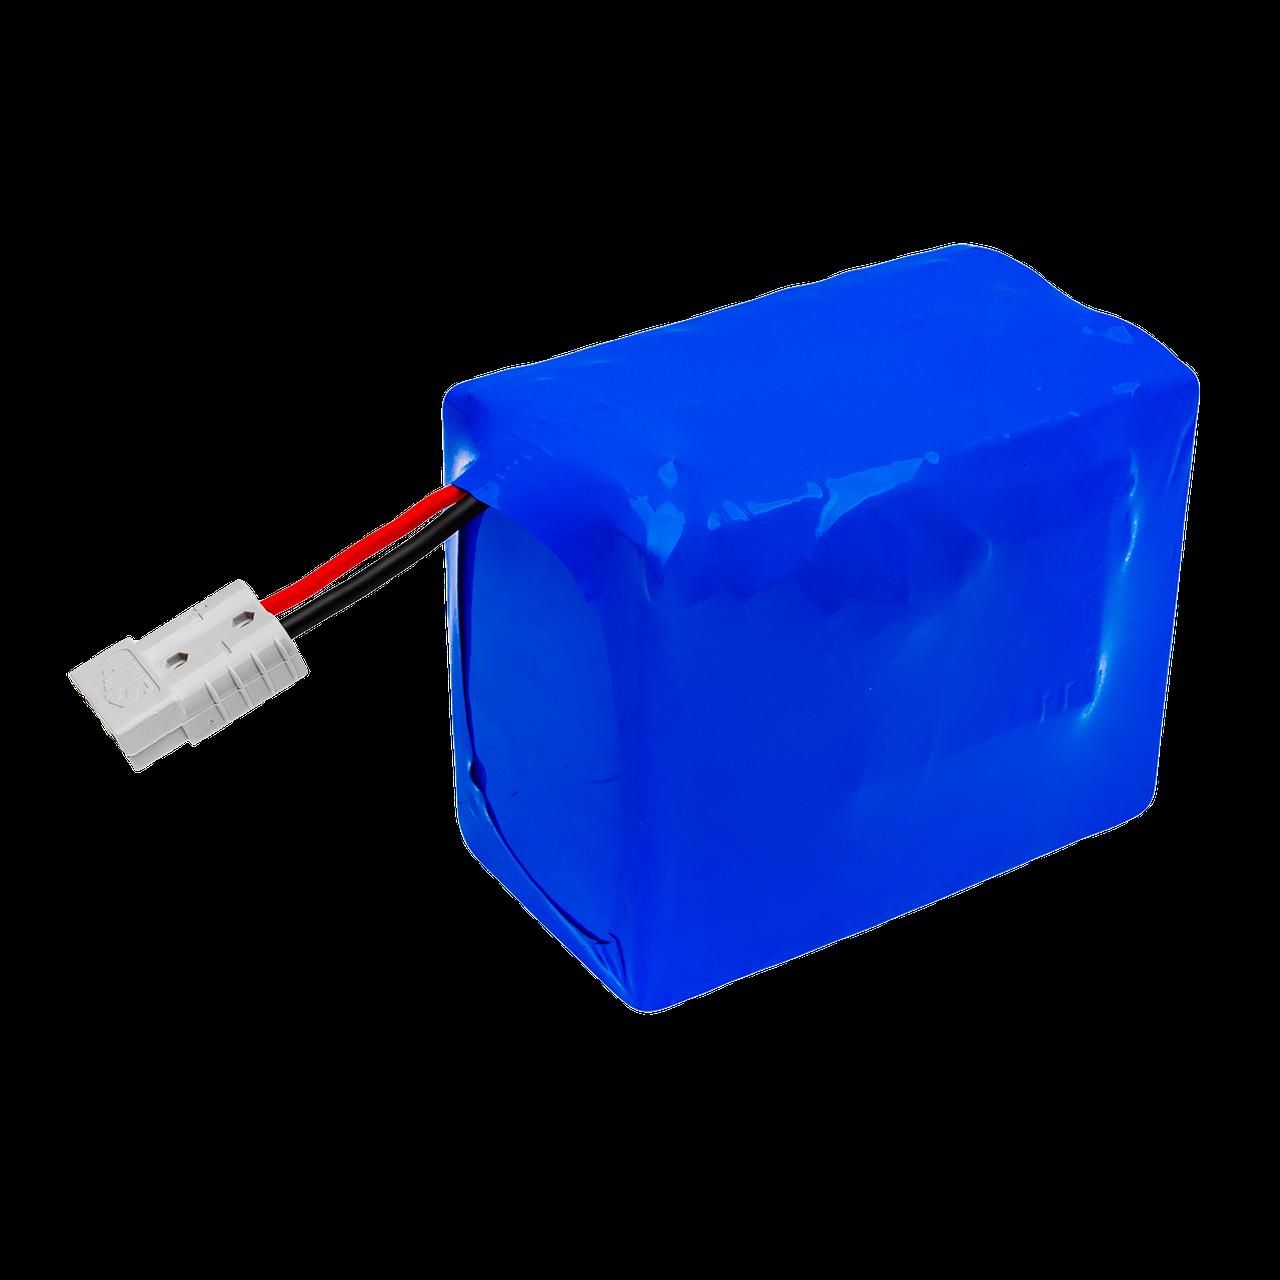 Аккумулятор LP LiFePo-4 48 V - 30 Ah (BMS 60A) 2-й форм-фактор